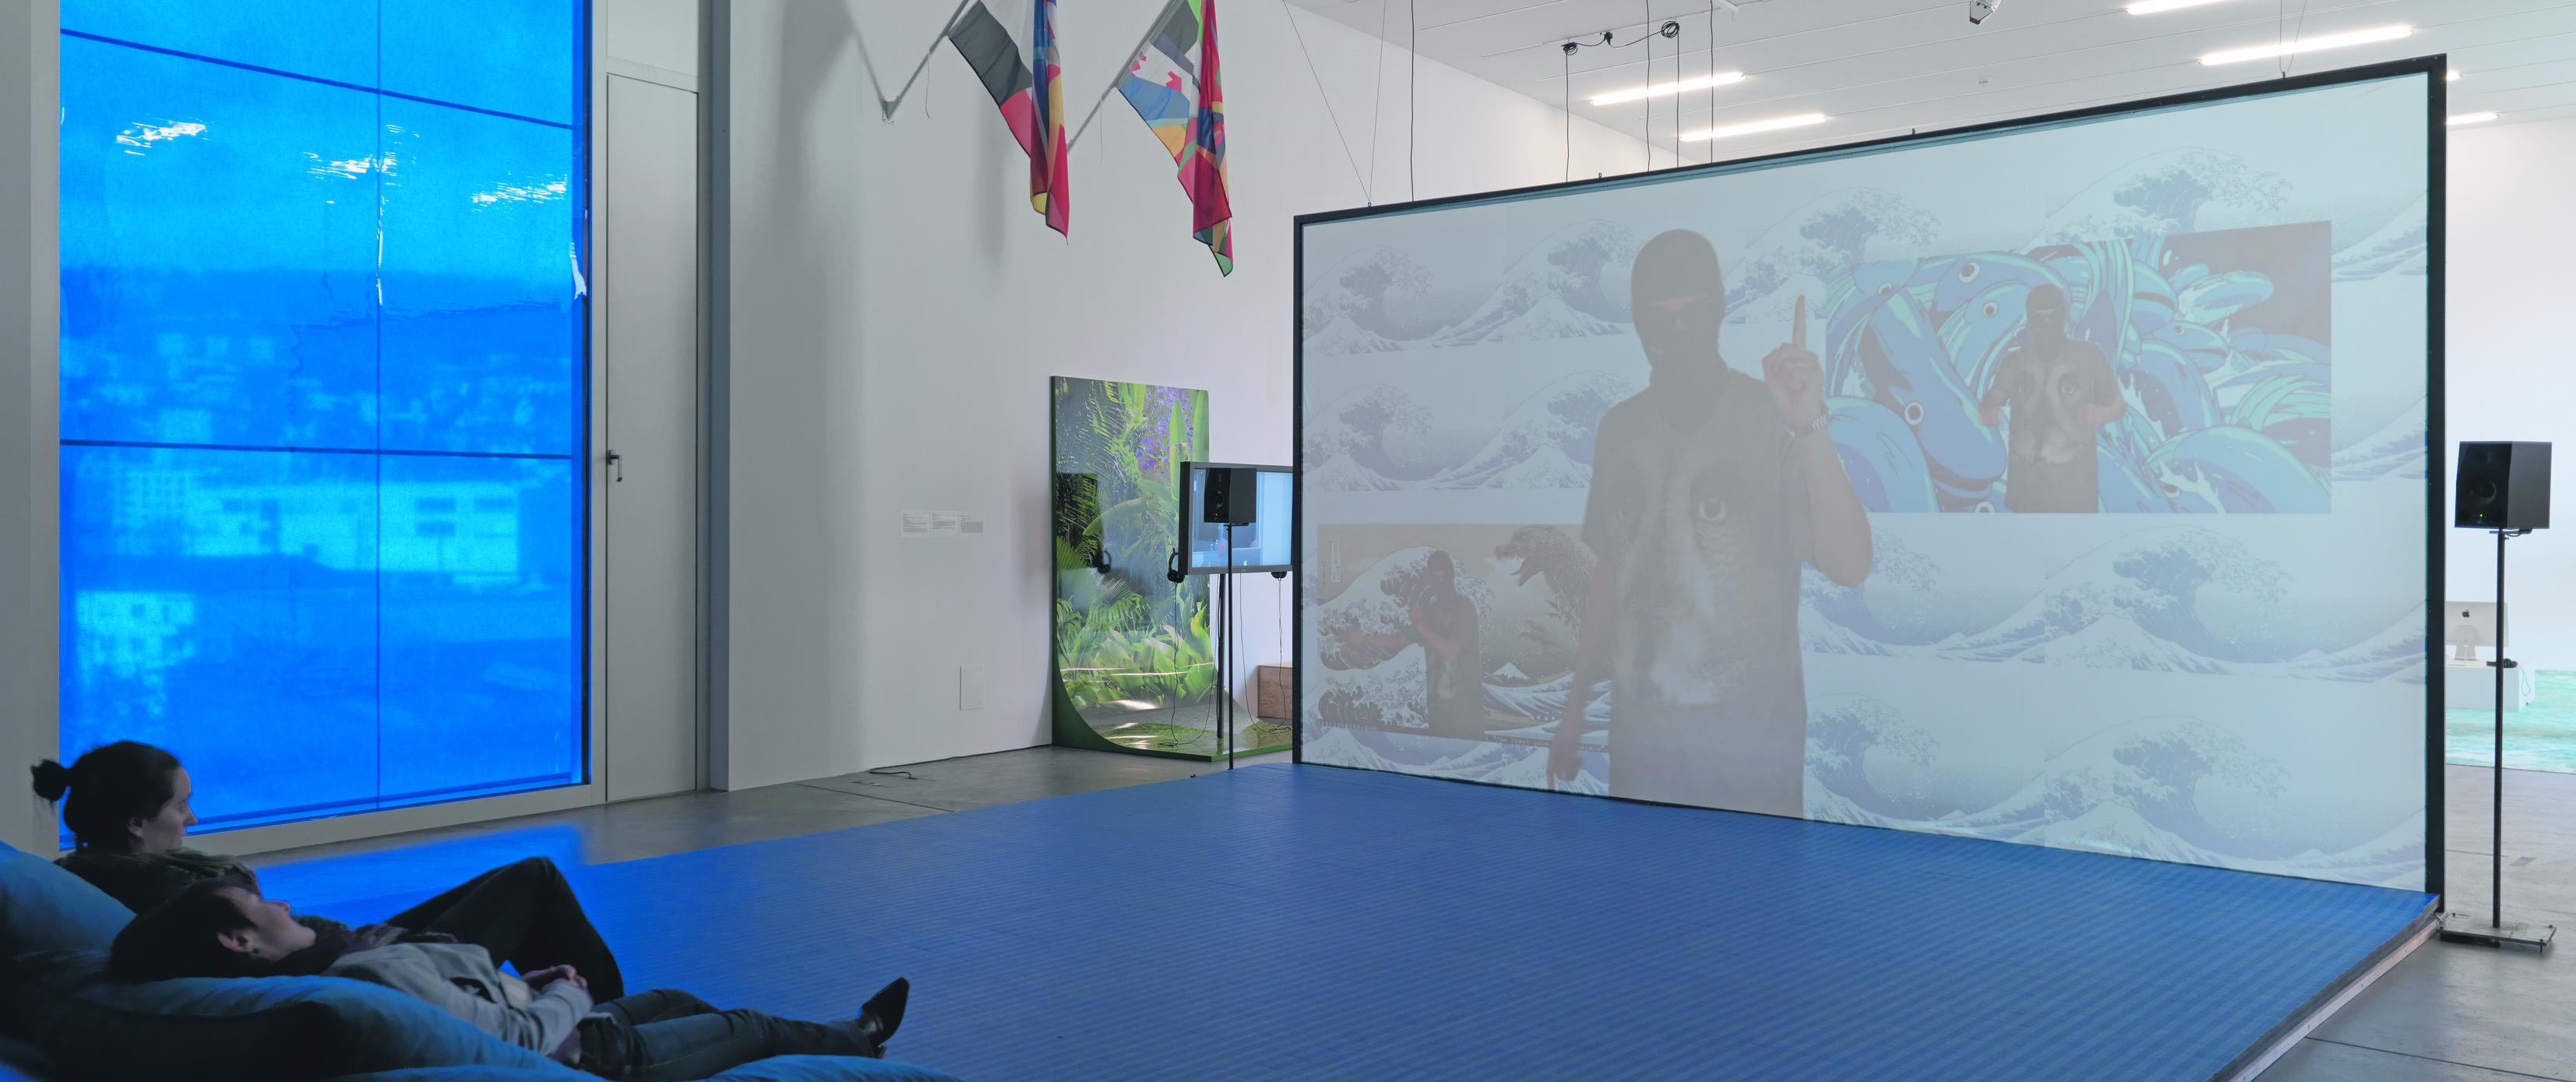 """Filter Bubble"" is a collaboration with Sarah Abu Abdallah (Providence), Sophia Al Maria (Doha), Abdullah Al-Mutairi (New York), Rachael Allen (London), Yollotl Alvarado (Mexico City), ARCA & Jesse Kanda (London), Darja Bajagić (New York), Alessandro Bava (London), James Bridle (London), Andrea Crespo (New York), Manolis Daskalakis-Lemos (Athens), Alex Dolan (New York), Valia Fetisov (Moscow), Louisa Gagliardi (Zürich), Deanna Havas (New York), Max Hawkins (nomad), Bernhard Hegglin (Zürich), Ho Rui An (Singapur), Emmanuel Iduma (New York), Nicholas Korody (Los Angeles), Isabel Legate (New York), Luca Lum & Marcus Yee (Singapur), Nicholas Maurer (Sydney), Felix Melia (London), Mitchell Messina (Kapstadt), Ryan Murphy (New York), Wyatt Niehaus (New York), Adriana Ramić (New York), Tabita Rezaire (Johannesburg), Bunny Rogers (Stockholm), Ben Rosenthal (Zürich), Bogosi Sekhukhuni (Johannesburg), Takeshi Shiomitsu (London), Crista Siglin & Isaac Wilder (Kansas City), Jasper Spicero (New York), Jesse Stecklow (Los Angeles), Hito Steyerl (Berlin), Elisabeth Sutherland (Accra), Philipp Timischl (Wien), Alexander Jackson Wyatt (Sydney), Urban Zellweger (Zürich), Zou Zhao (New York), Bruno Zhu (Amsterdam), Damon Zucconi (New York)."